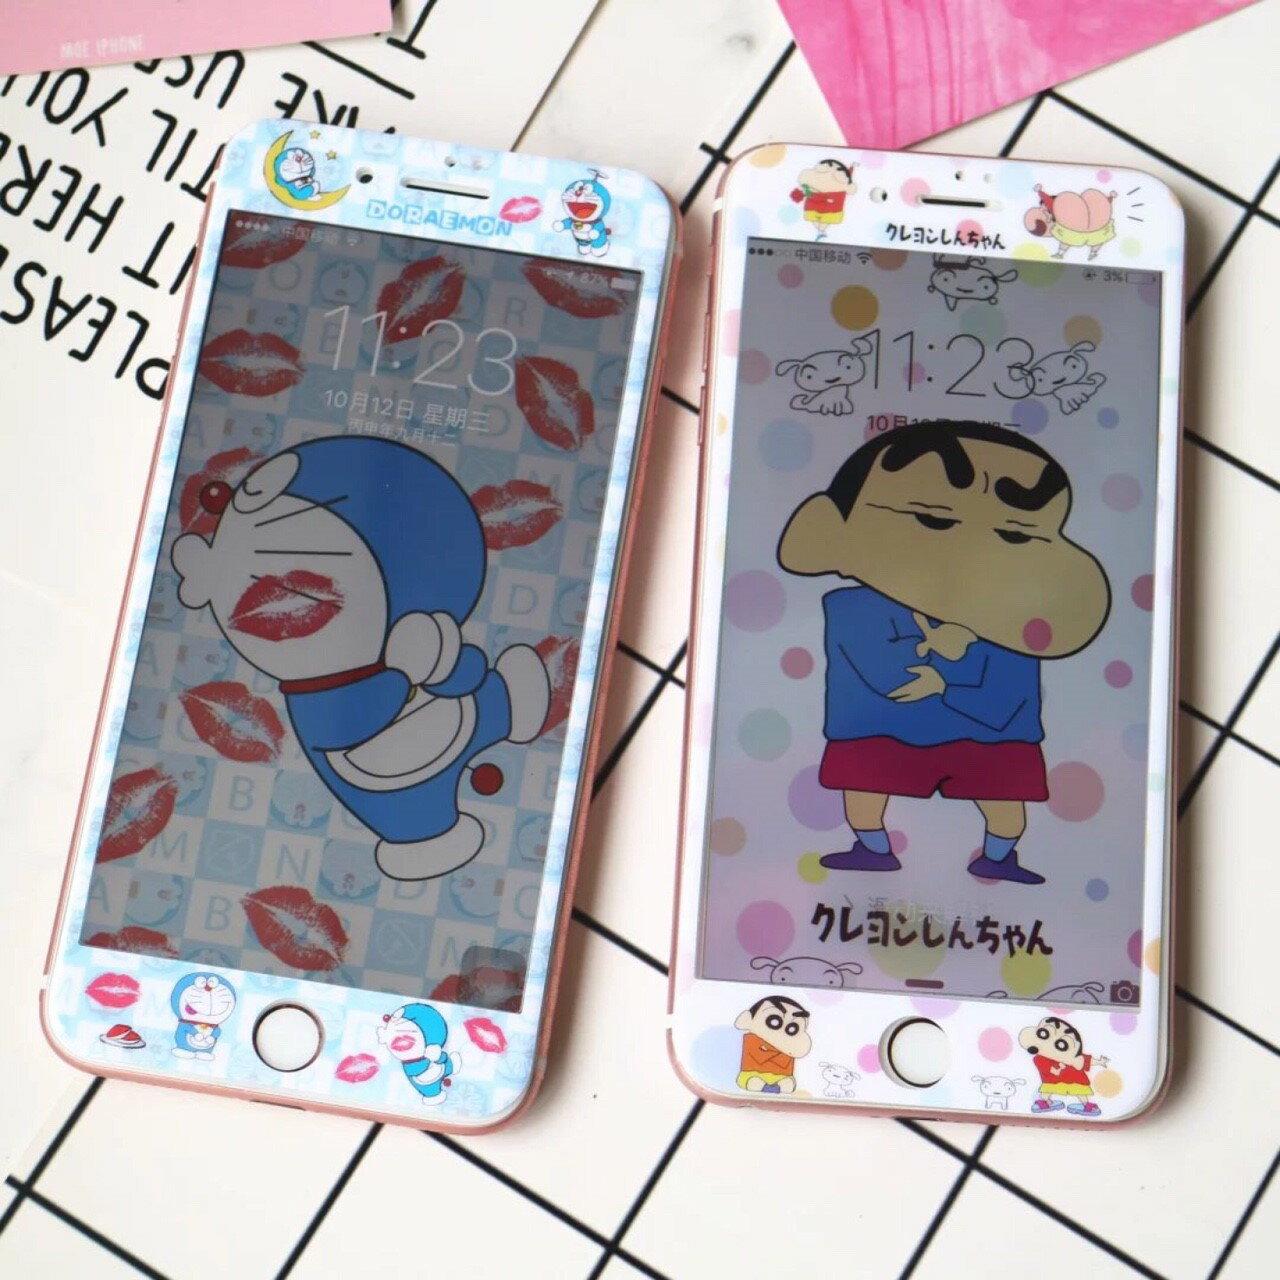 iPhone i6 I6s i6plus i7 i7plus 哆啦A夢 全屏保護貼 3D卡通 超薄9h鋼化膜 彩膜 手機螢幕貼【GP美貼】